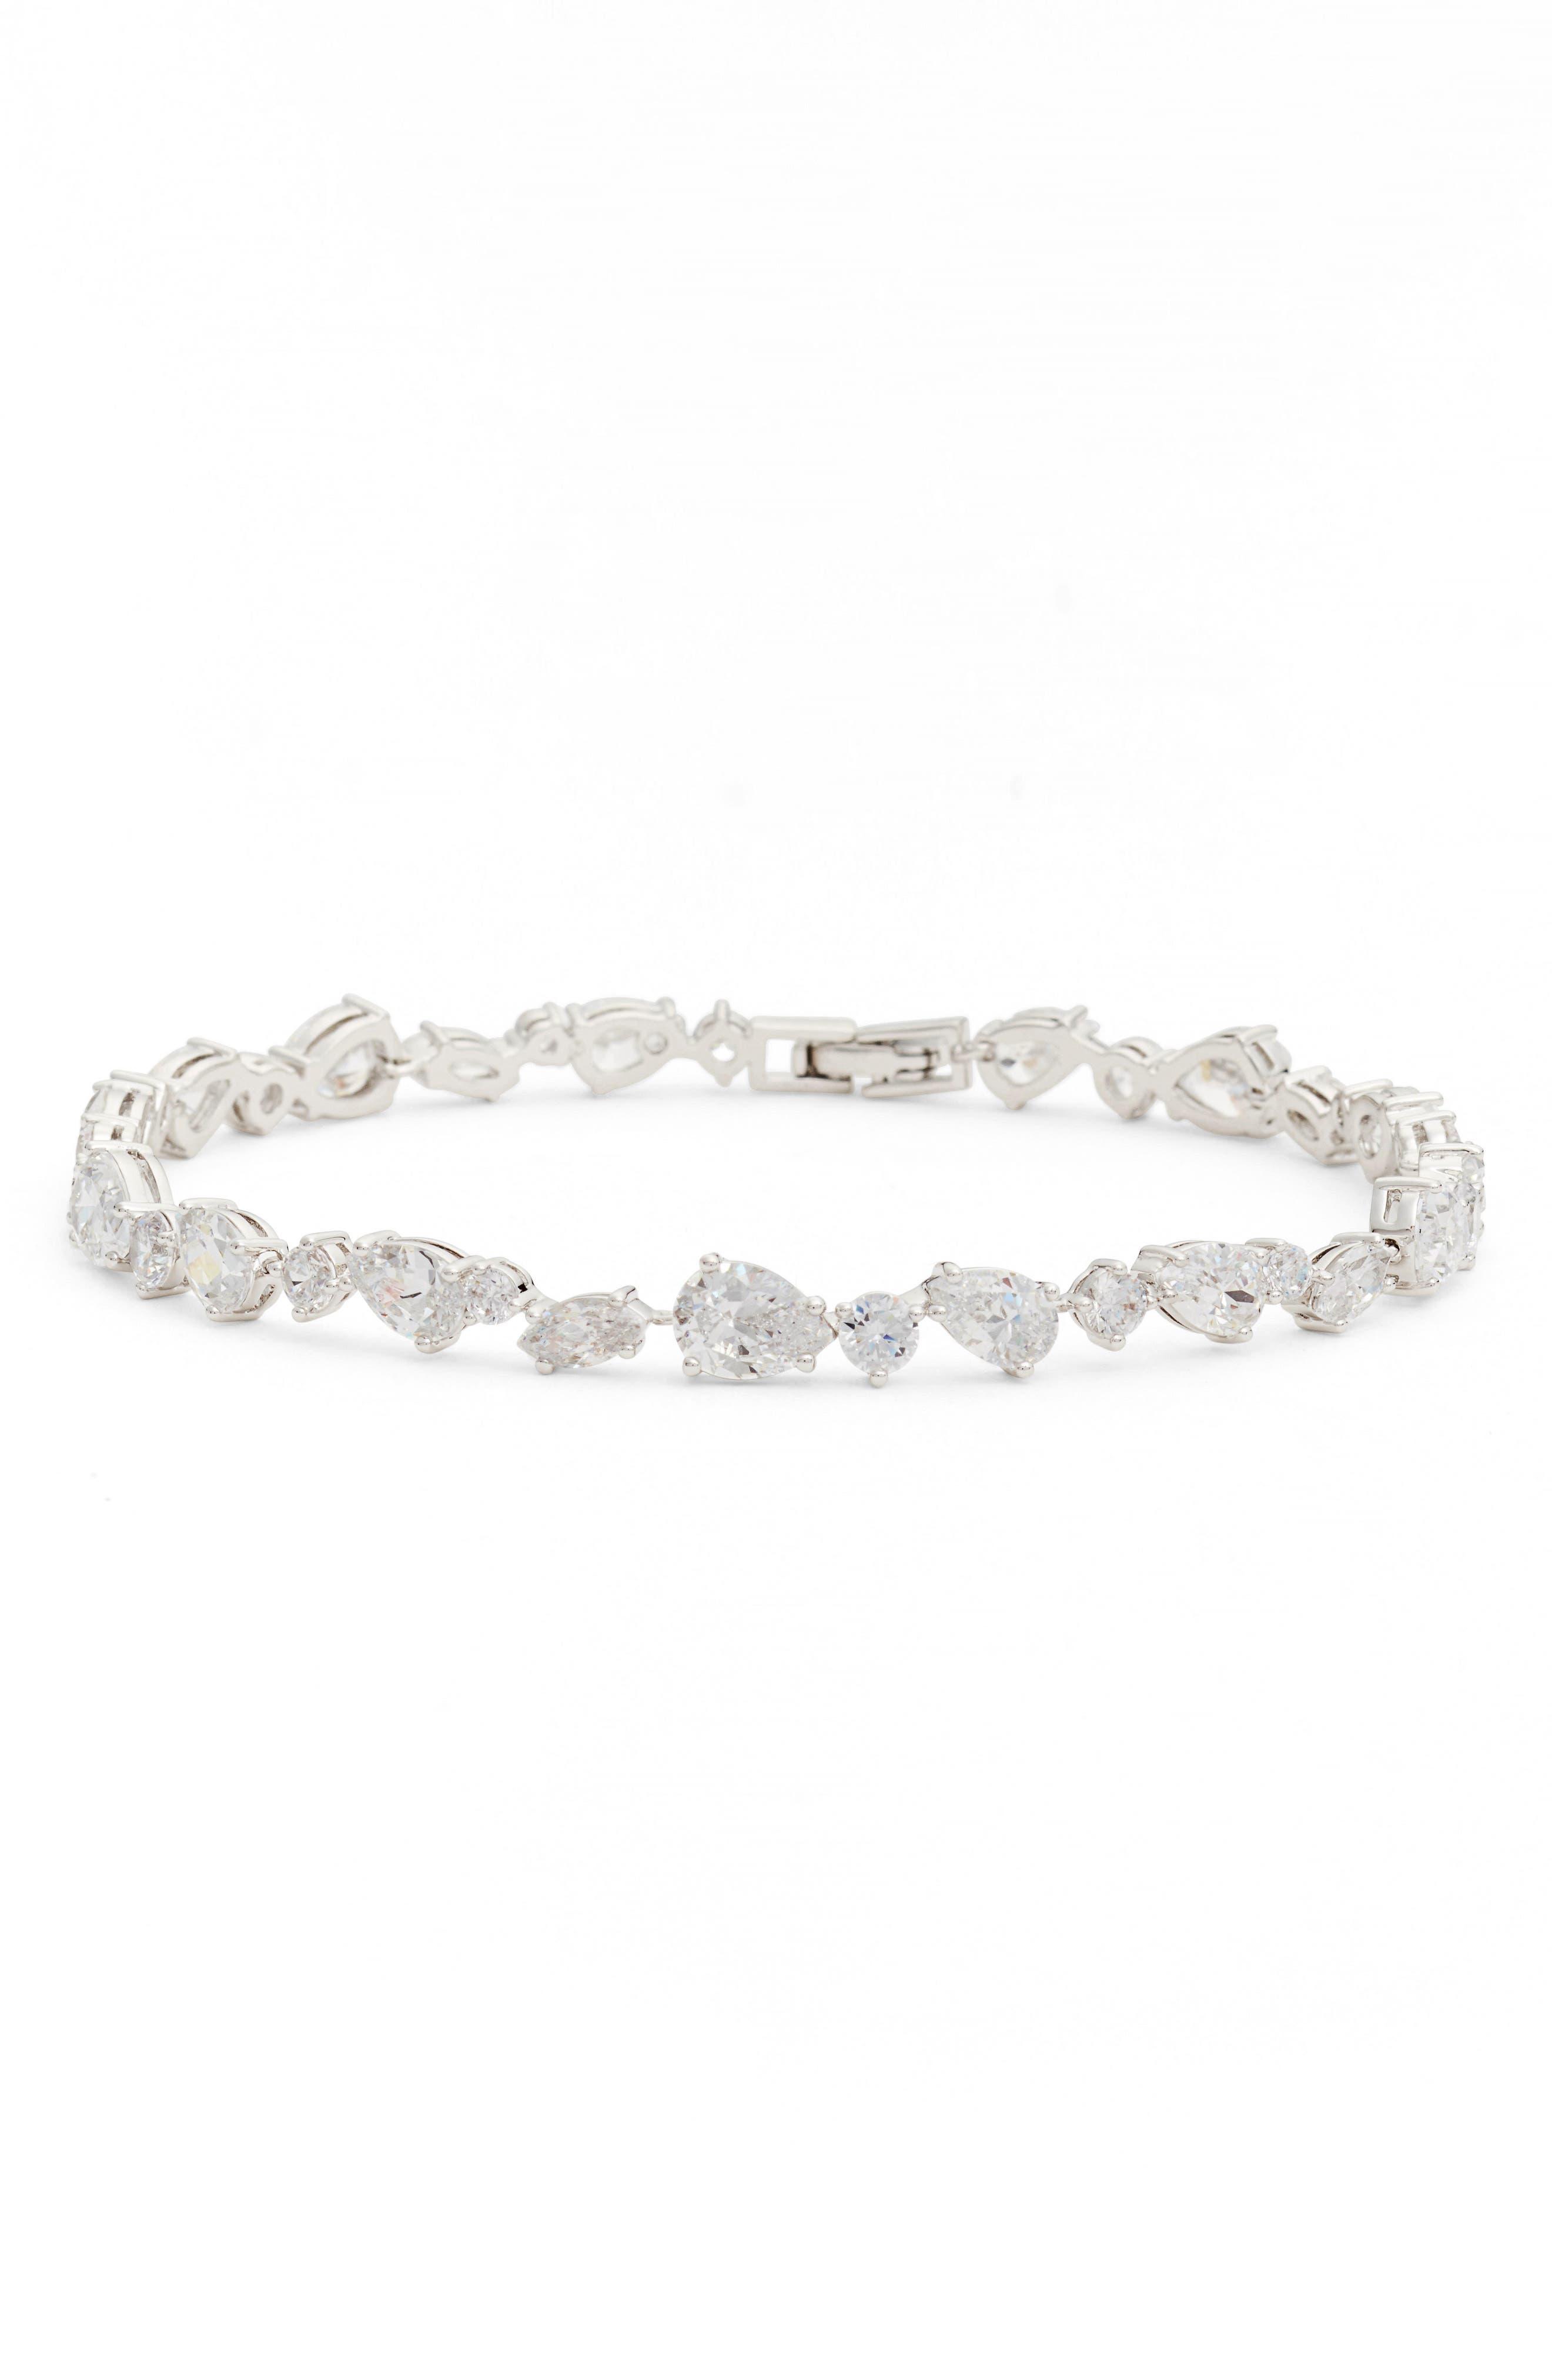 Main Image - Nadri Ava Line Bracelet